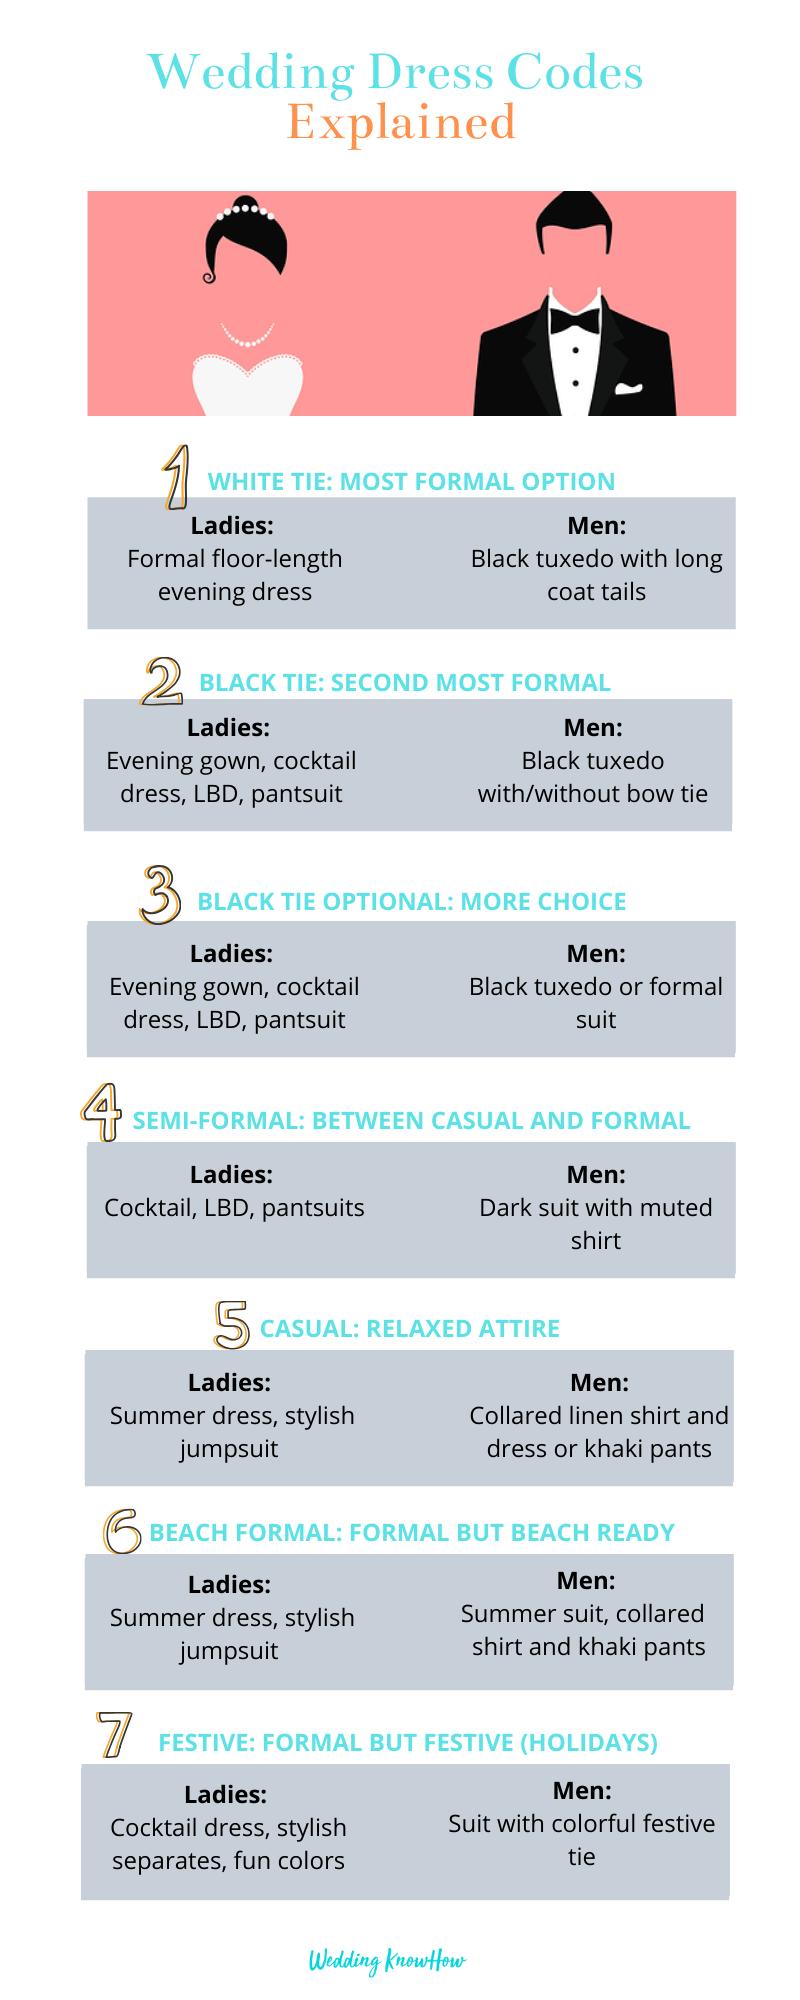 Wedding dress codes explained infographic